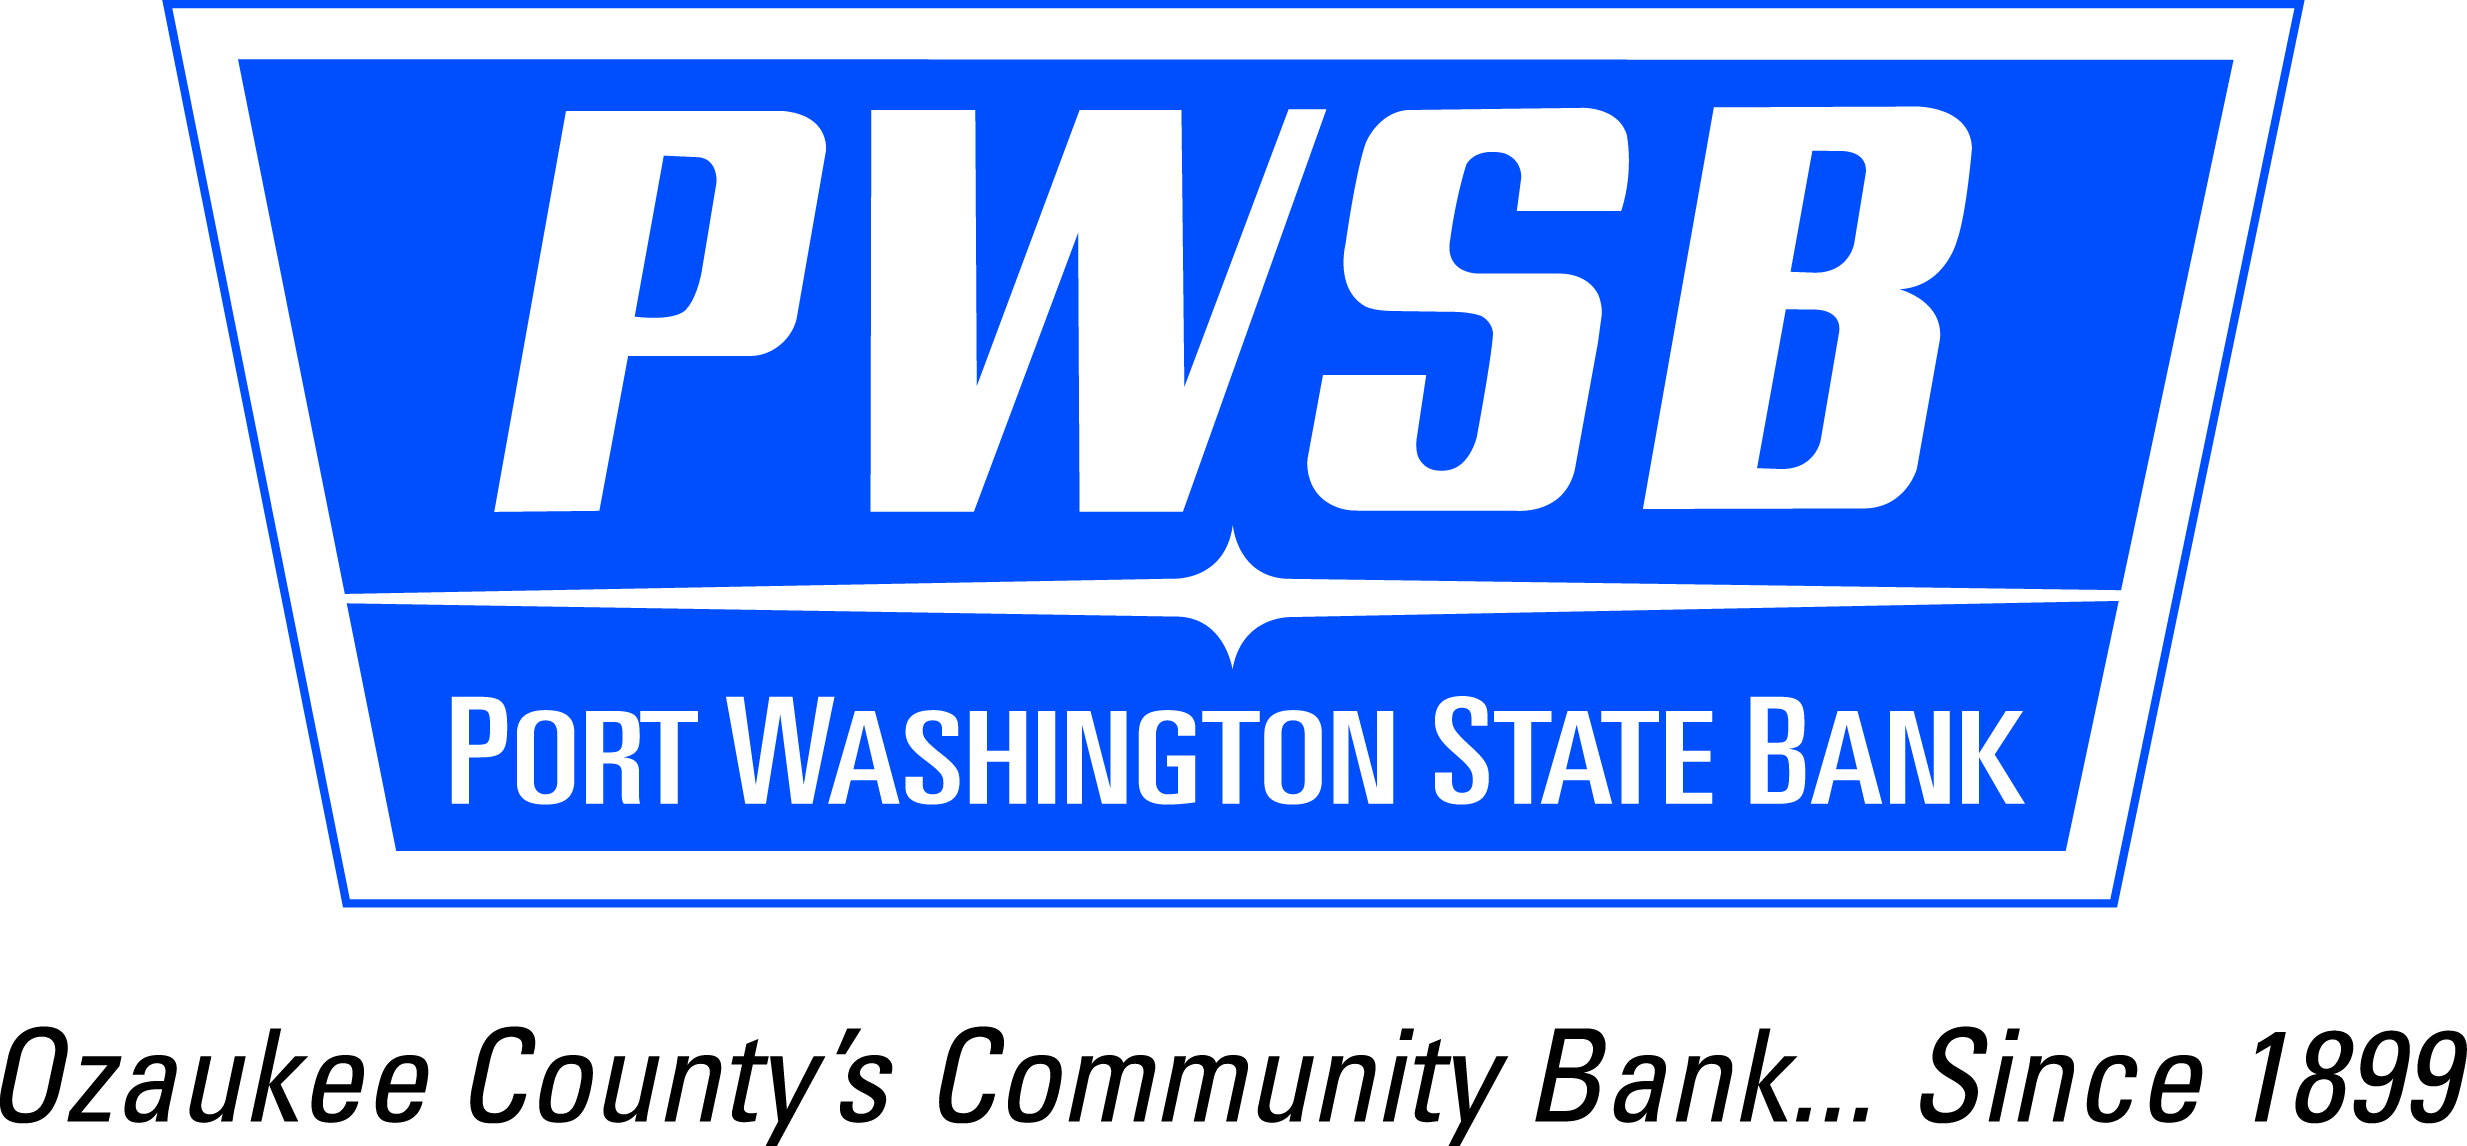 PWSB_OzaukeeCounty_wtag_CMYK 2014.new